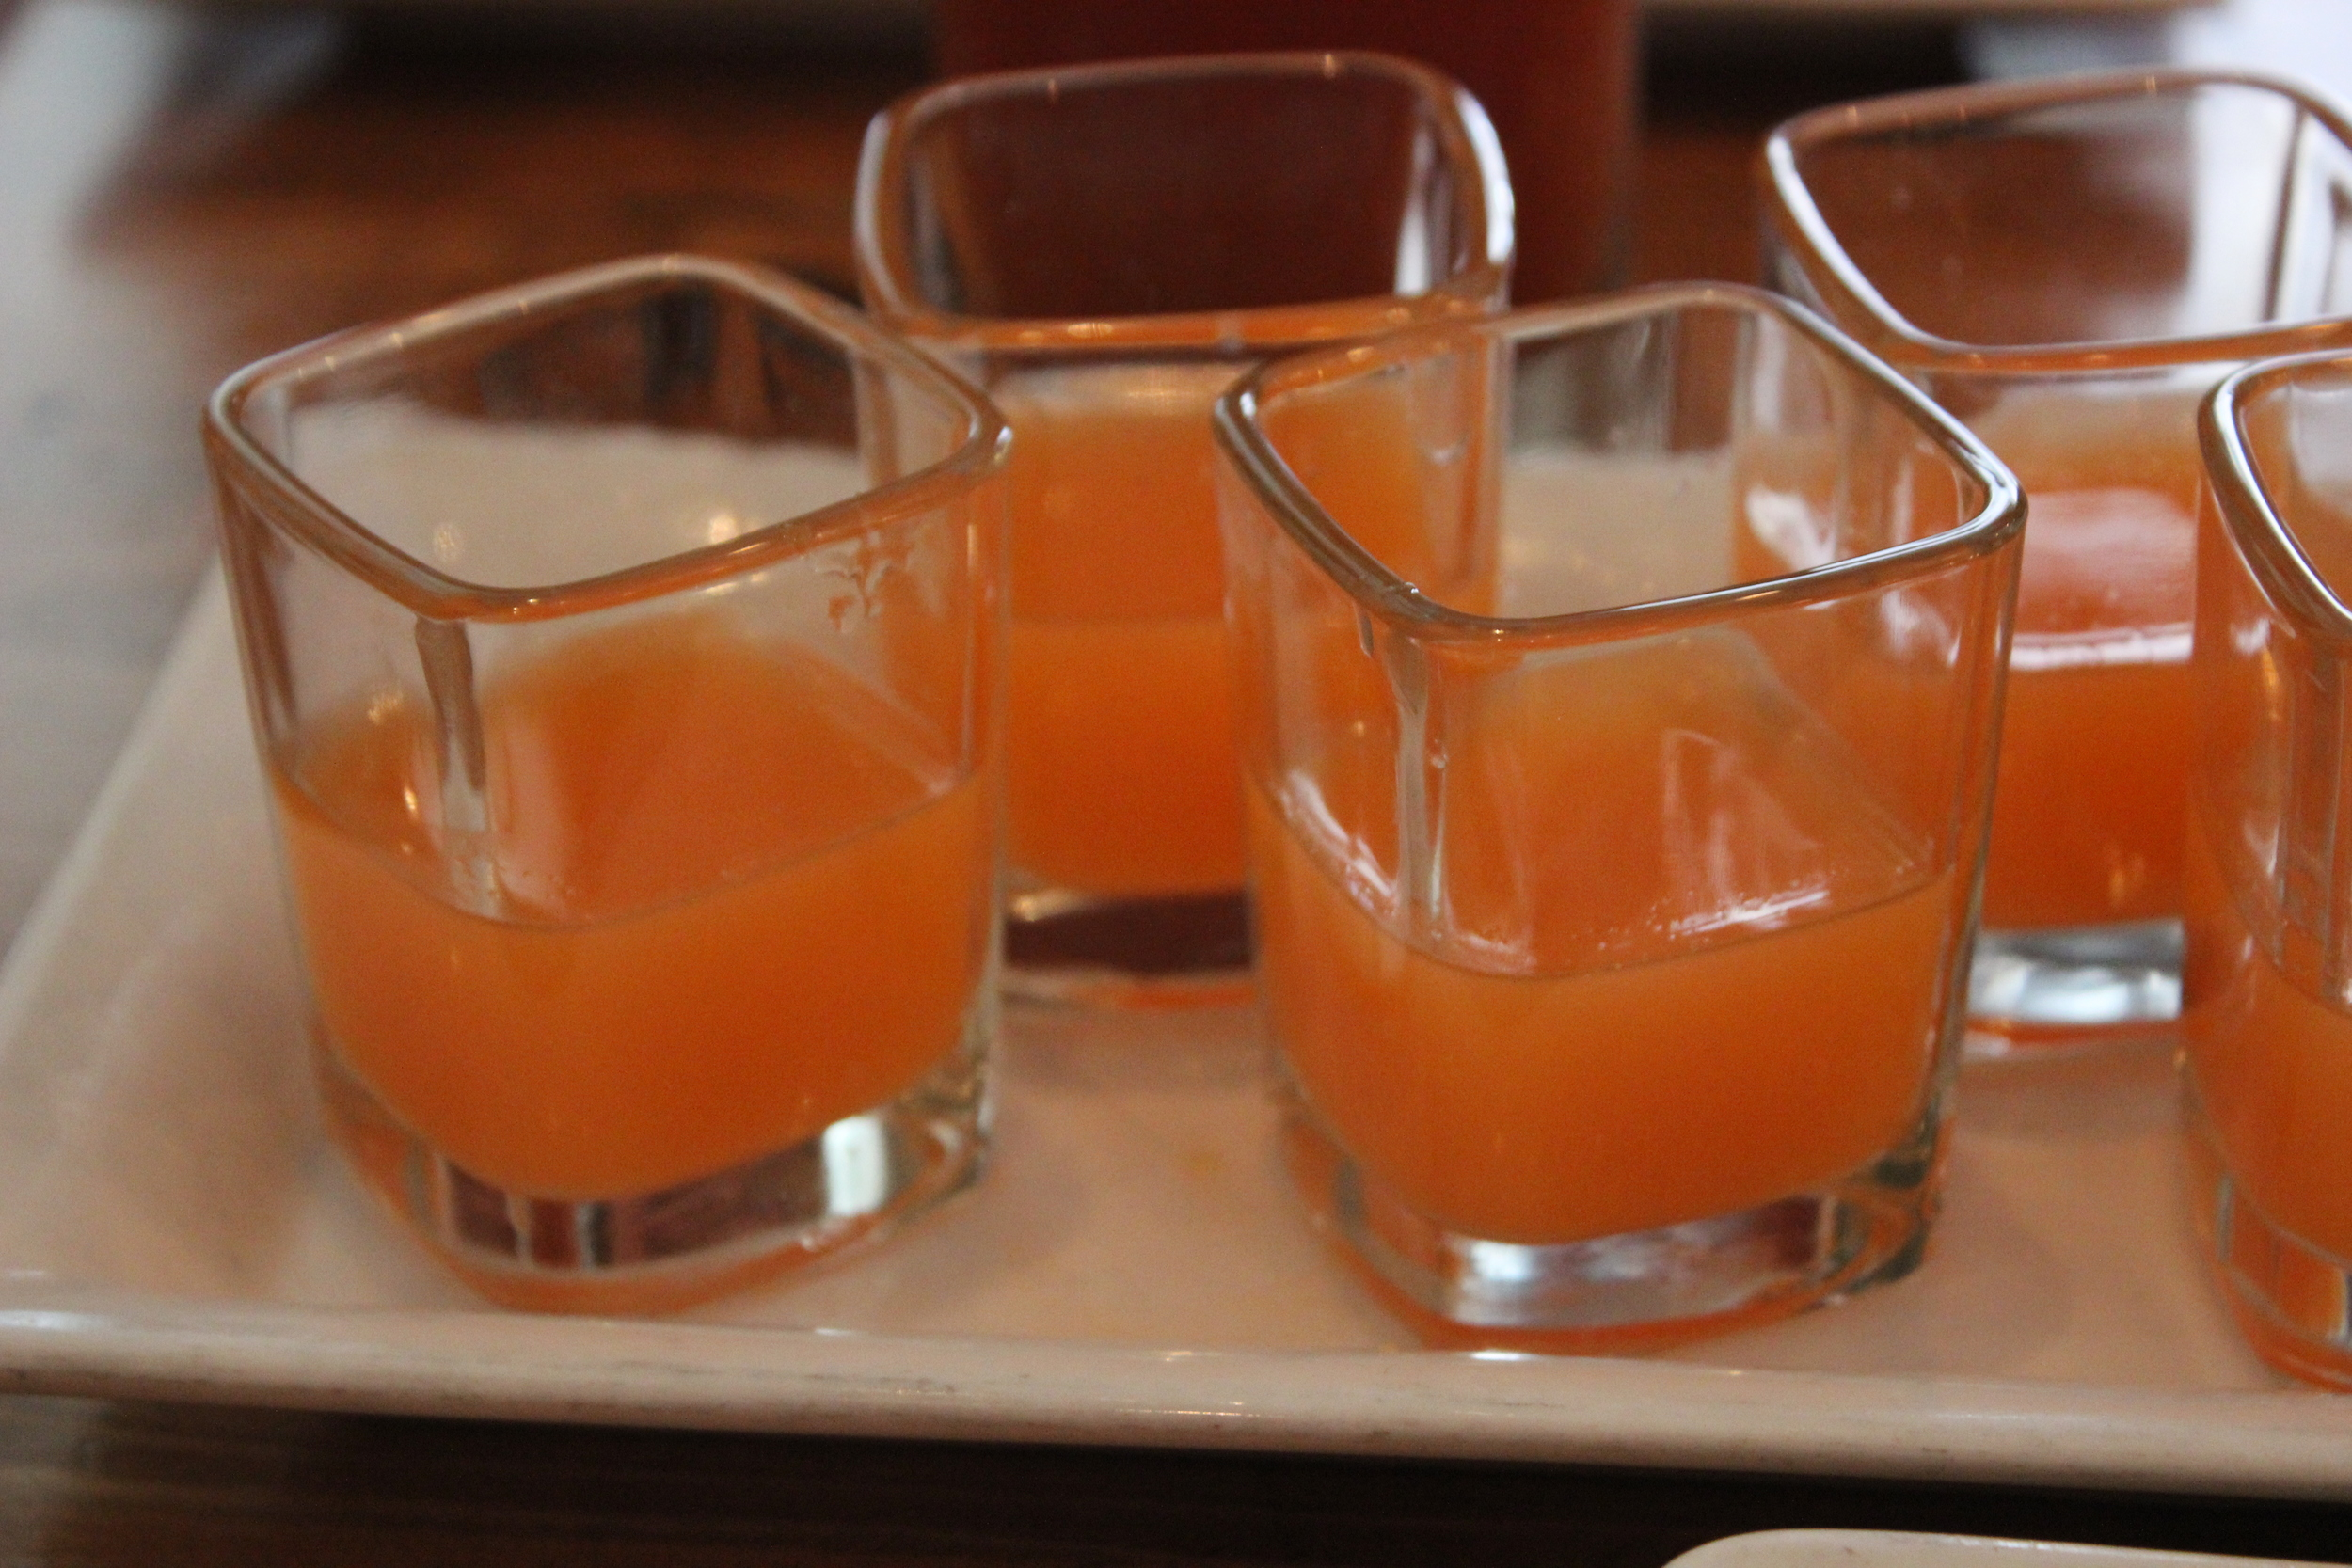 Fresh Squeezed Juice - Carrot & Cantaloupe